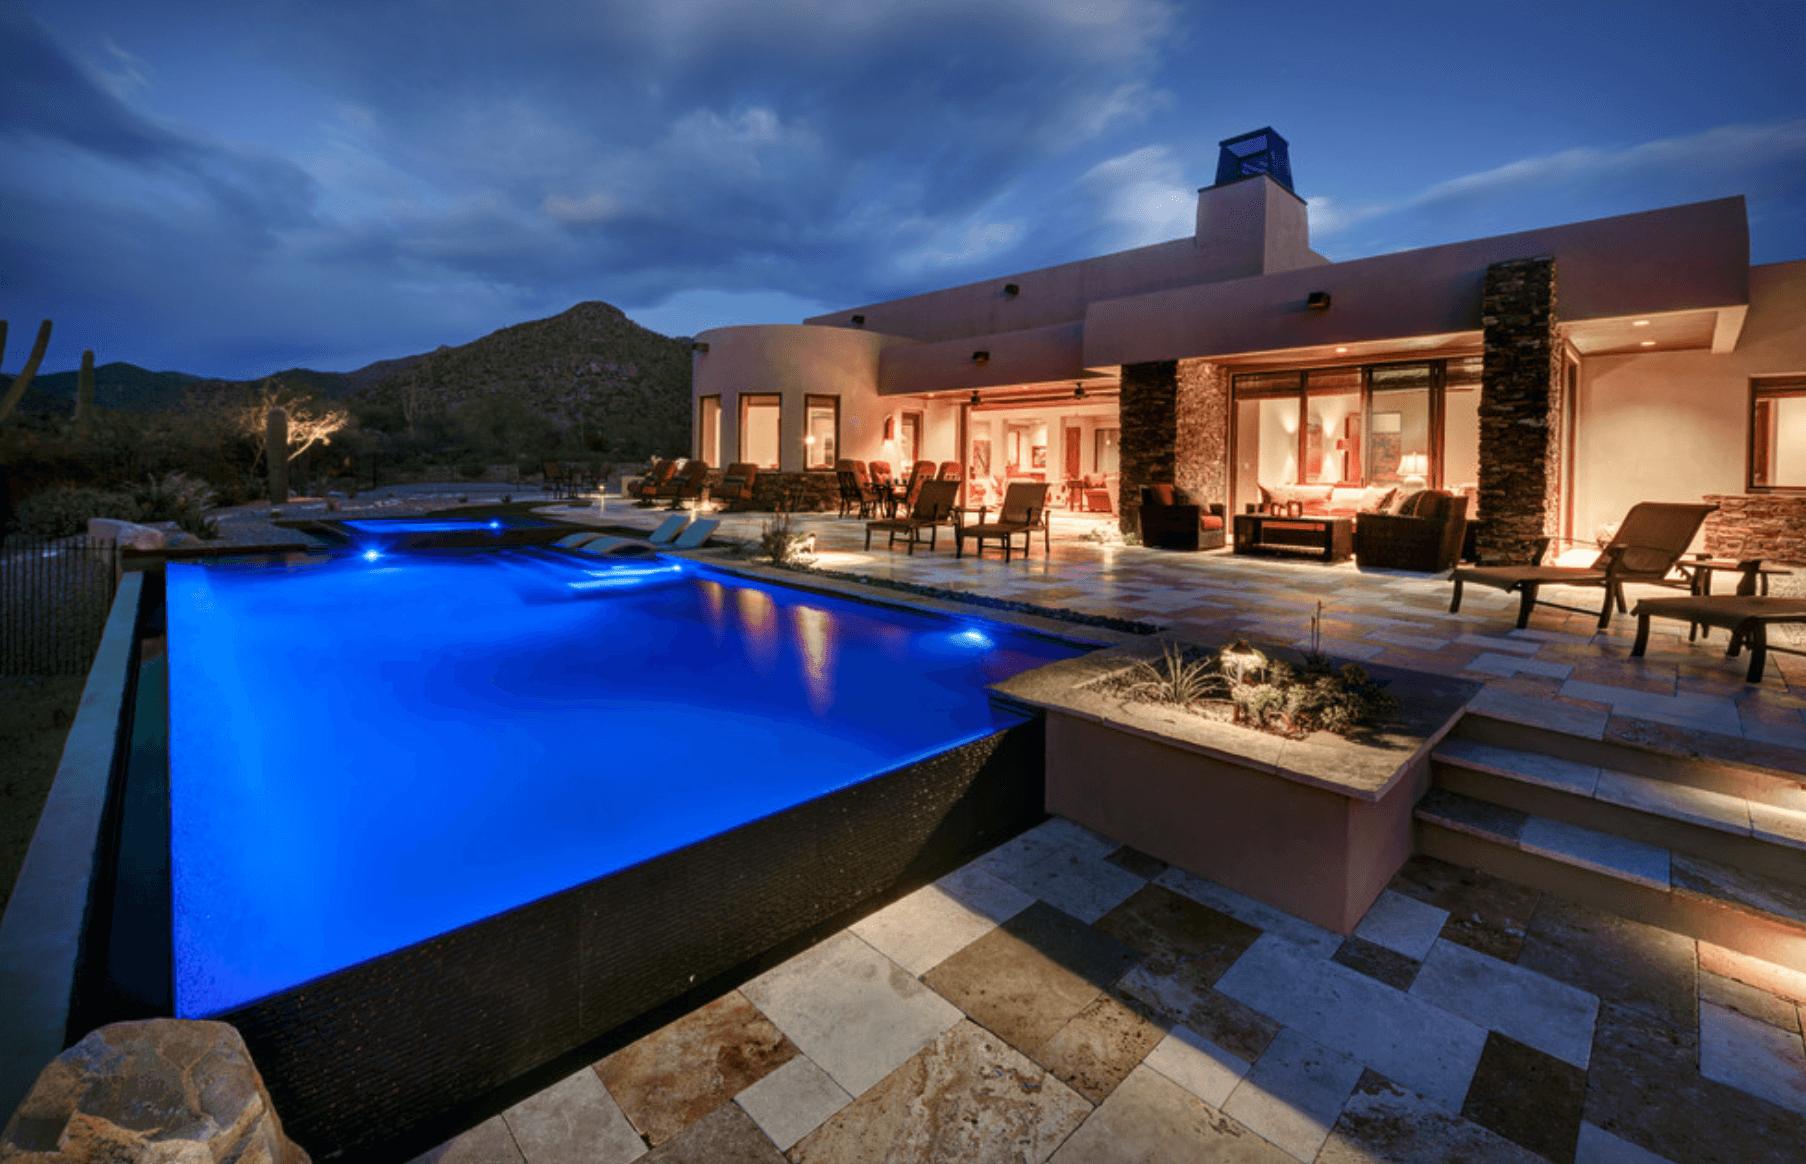 Casa de campo como projetar arquidicas for Fotos de casas de campo con piscina